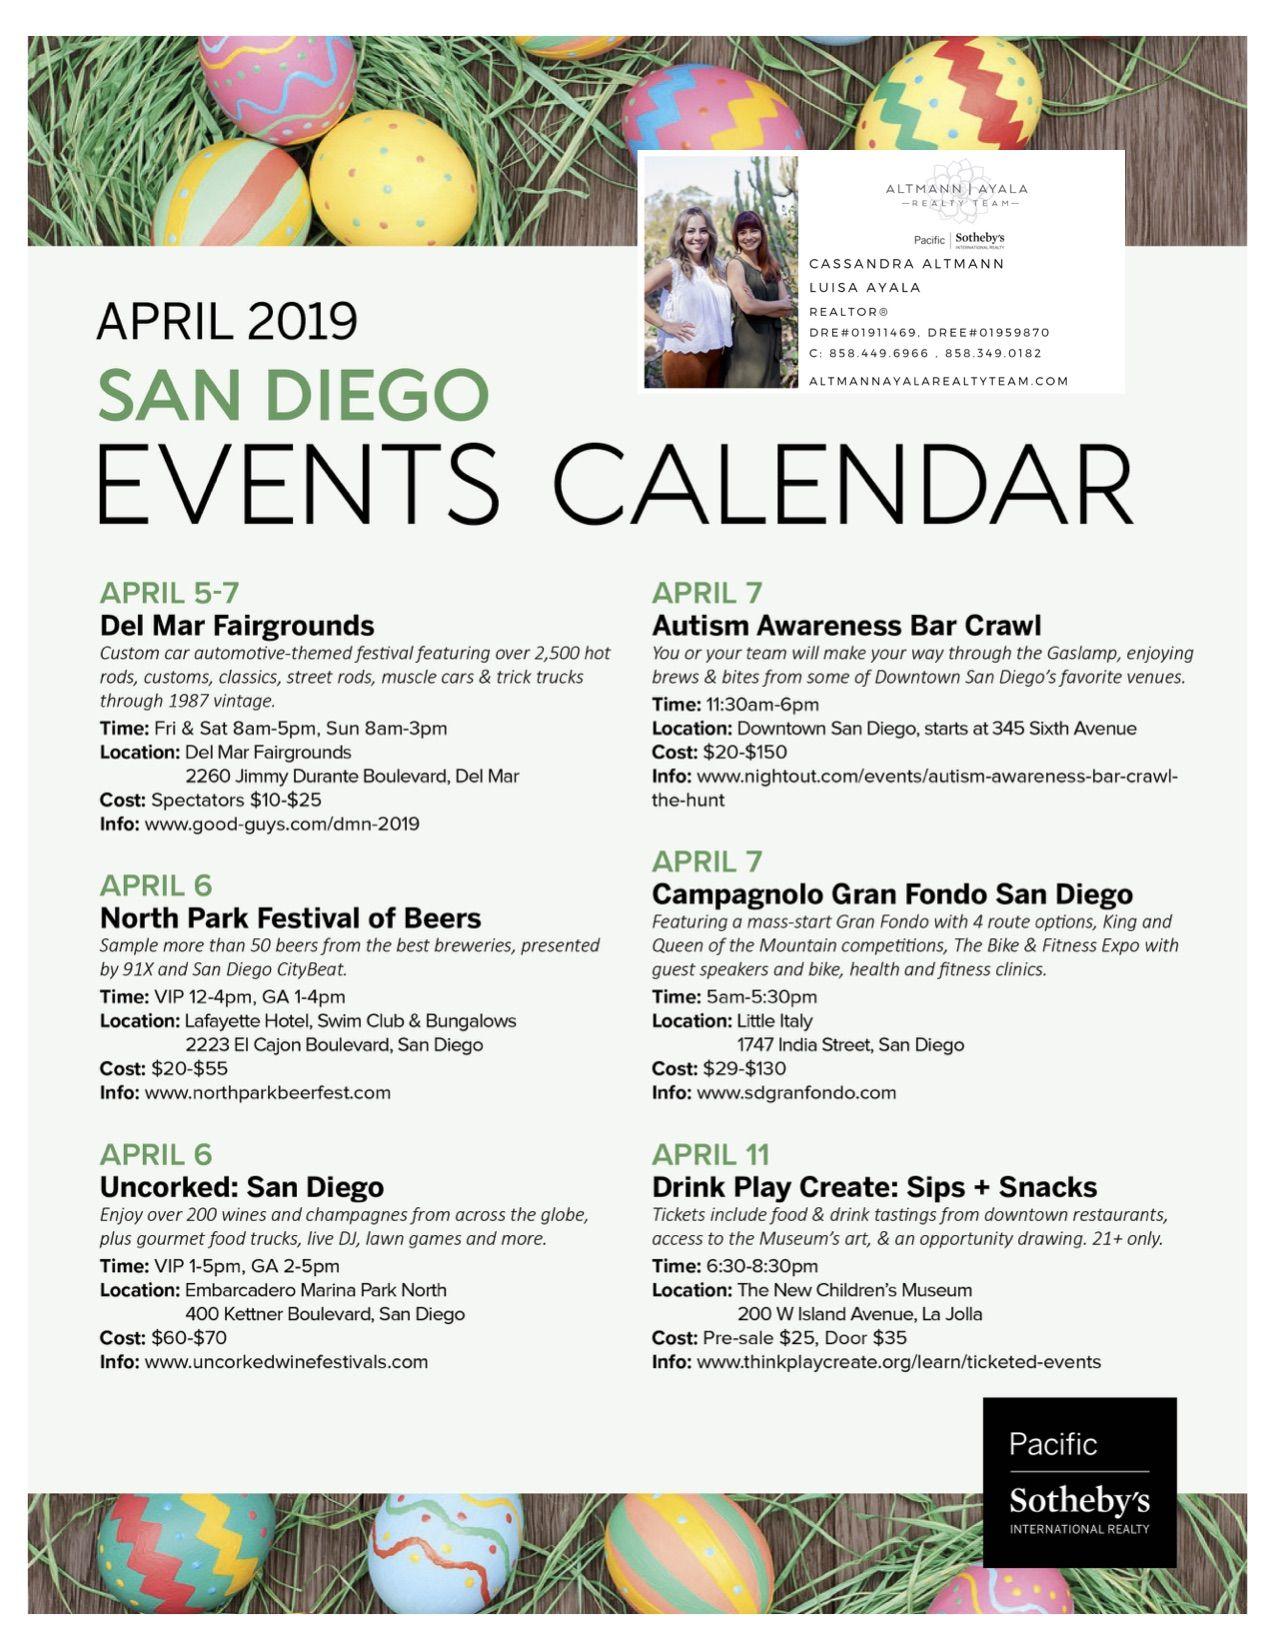 April 2019 San Diego Events Calendar